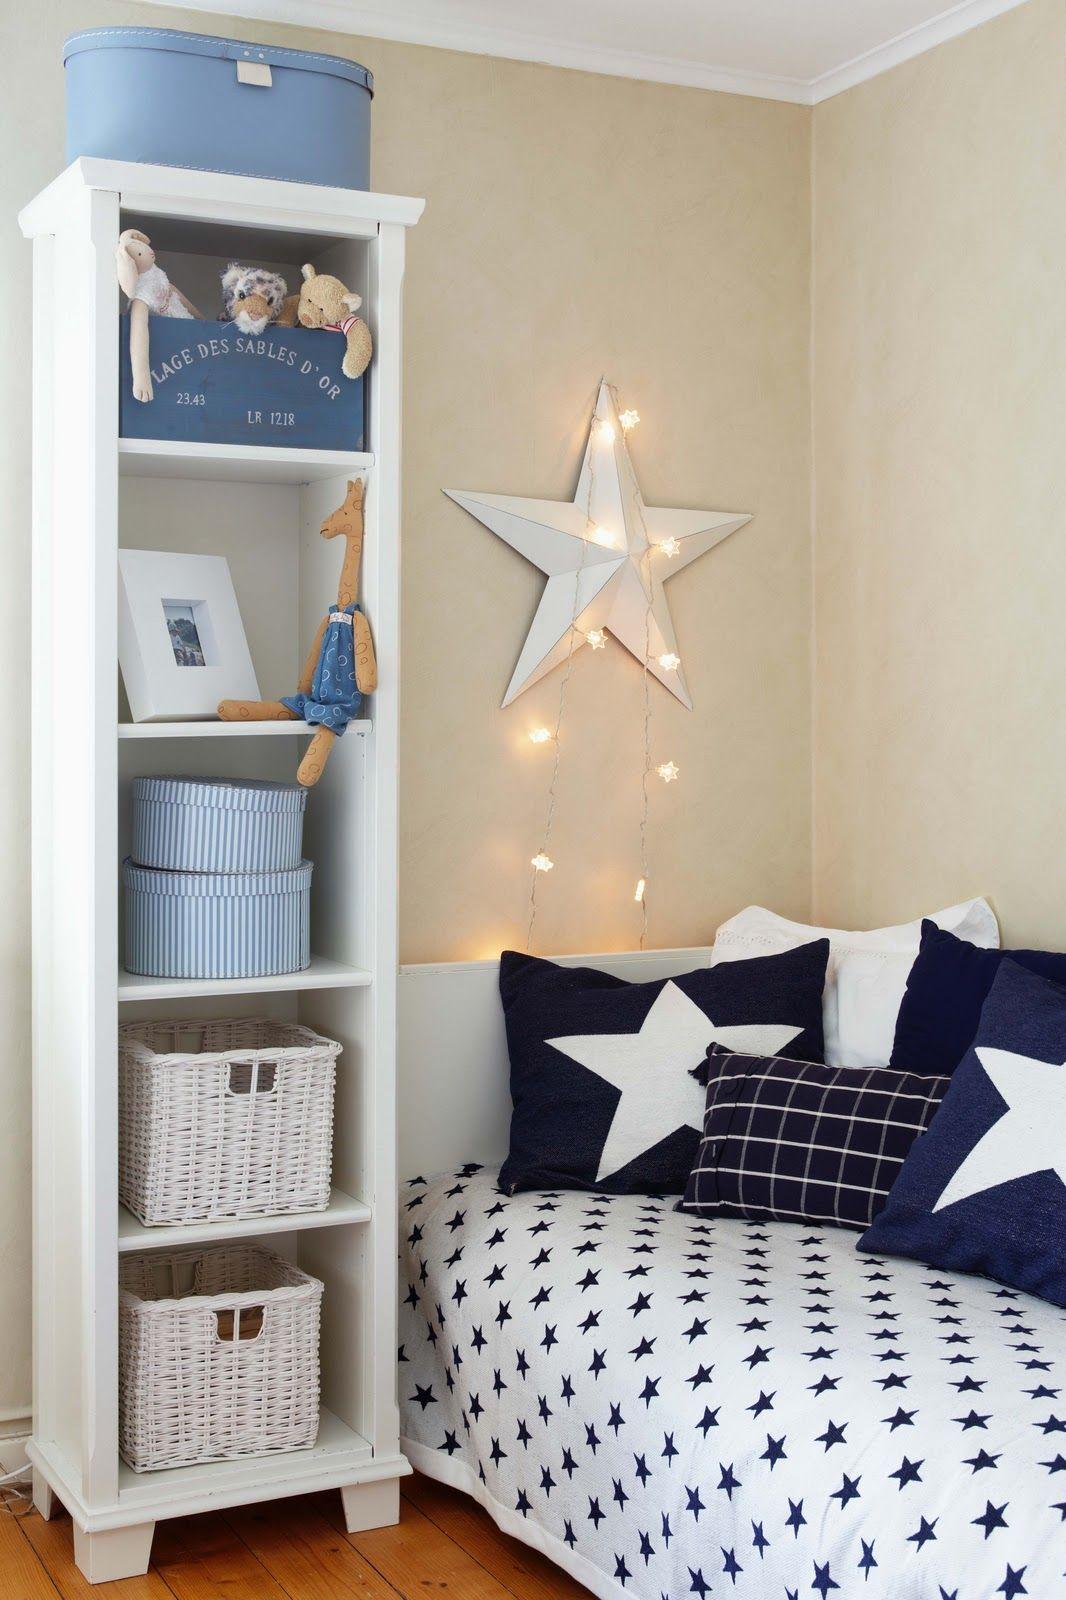 Stars kinderzimmer kinderzimmer babyzimmer kidsroom - Wandlampe babyzimmer ...